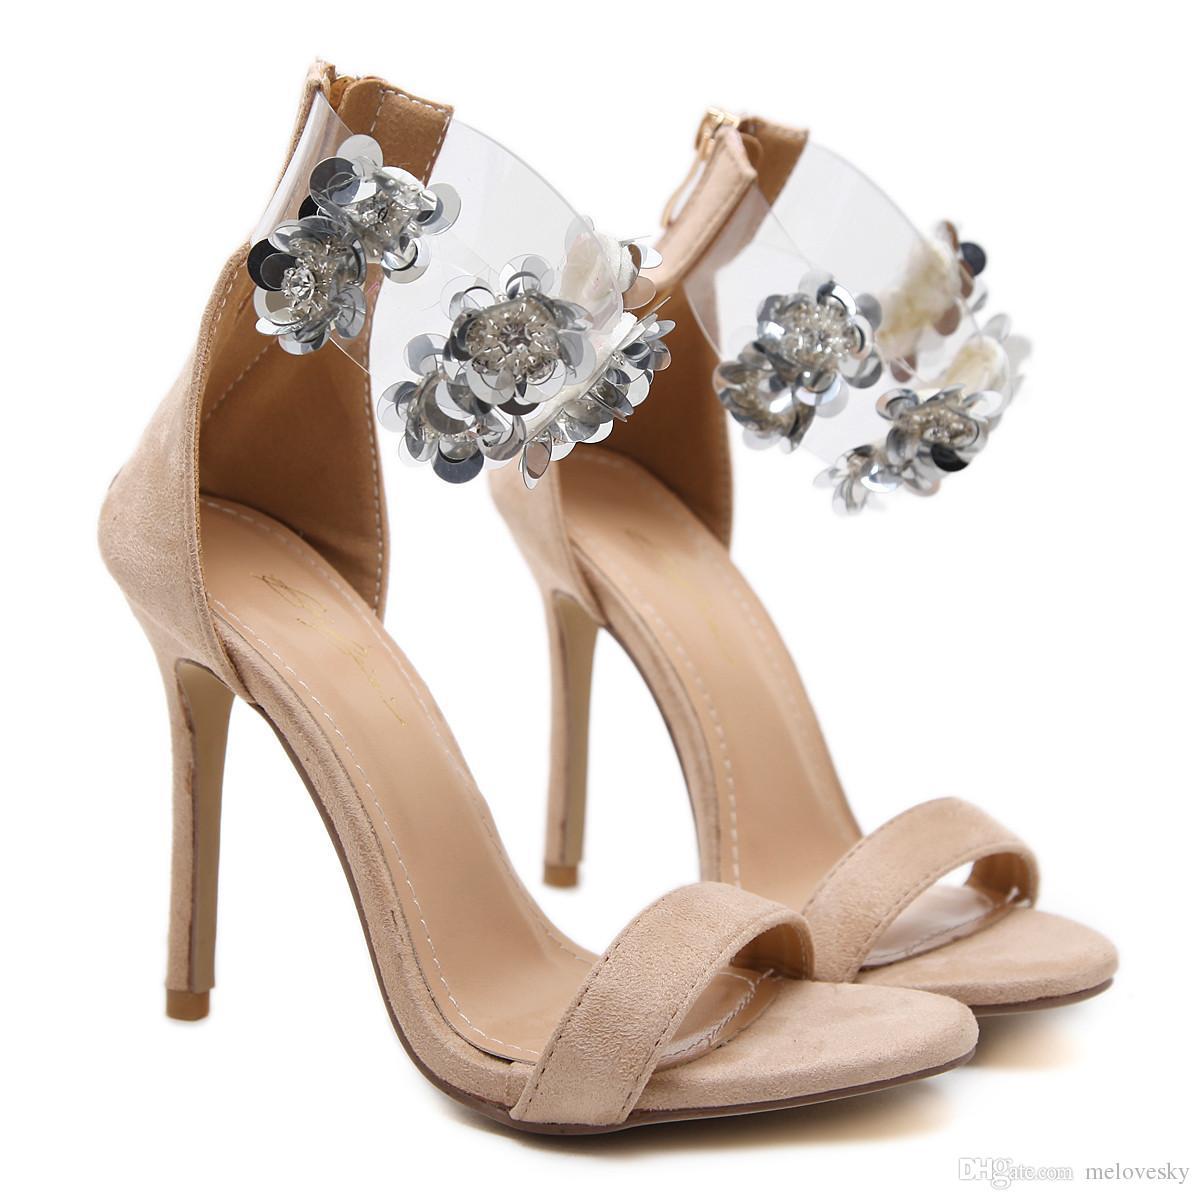 New Fashionl Women High Heel Open Toe Luxury Beads Crystal Flowers